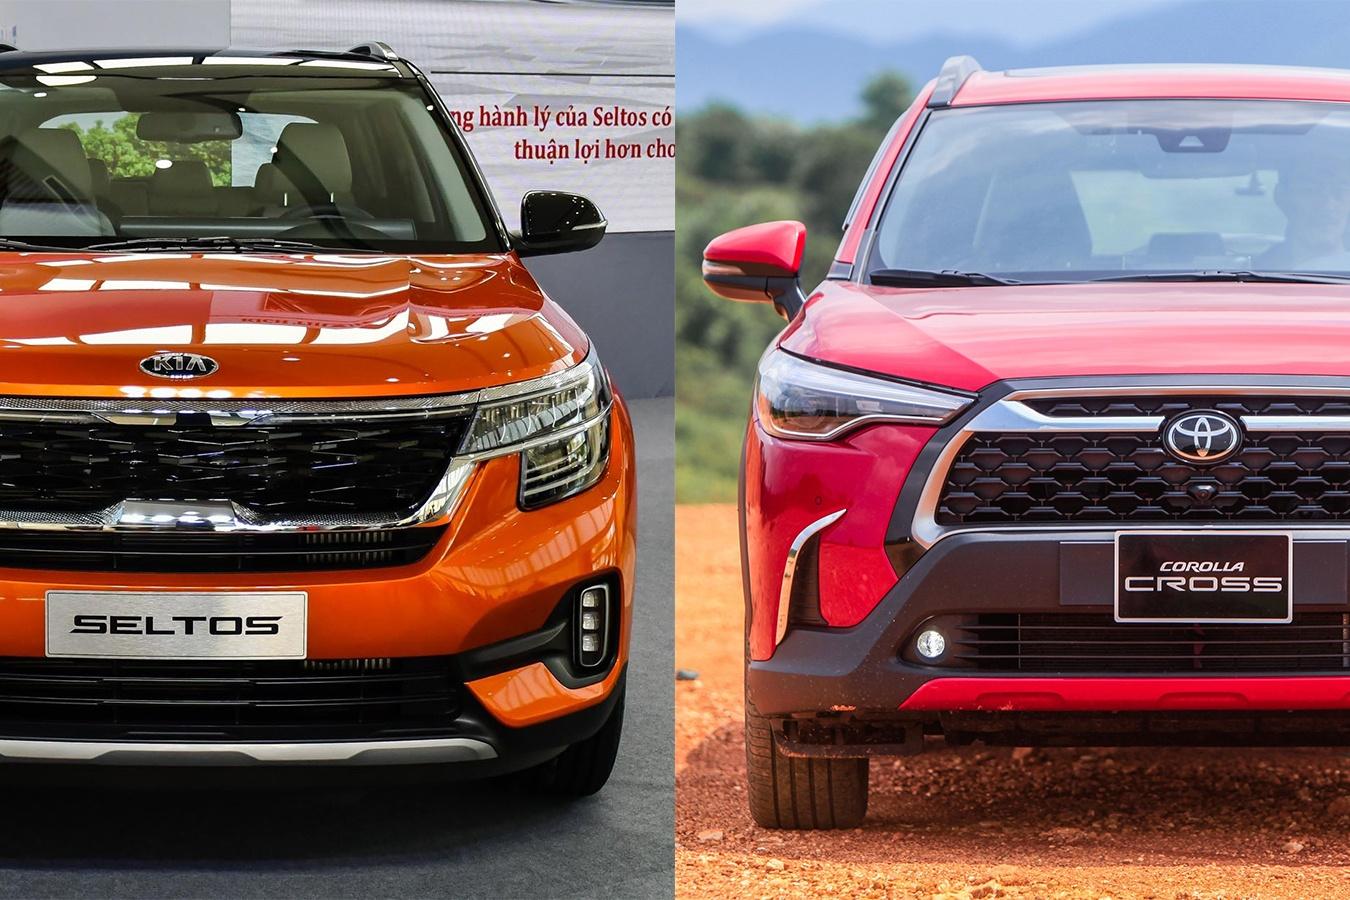 Chon Kia Seltos 1.4 Premium hay Toyota Corolla Cross 1.8V? anh 1